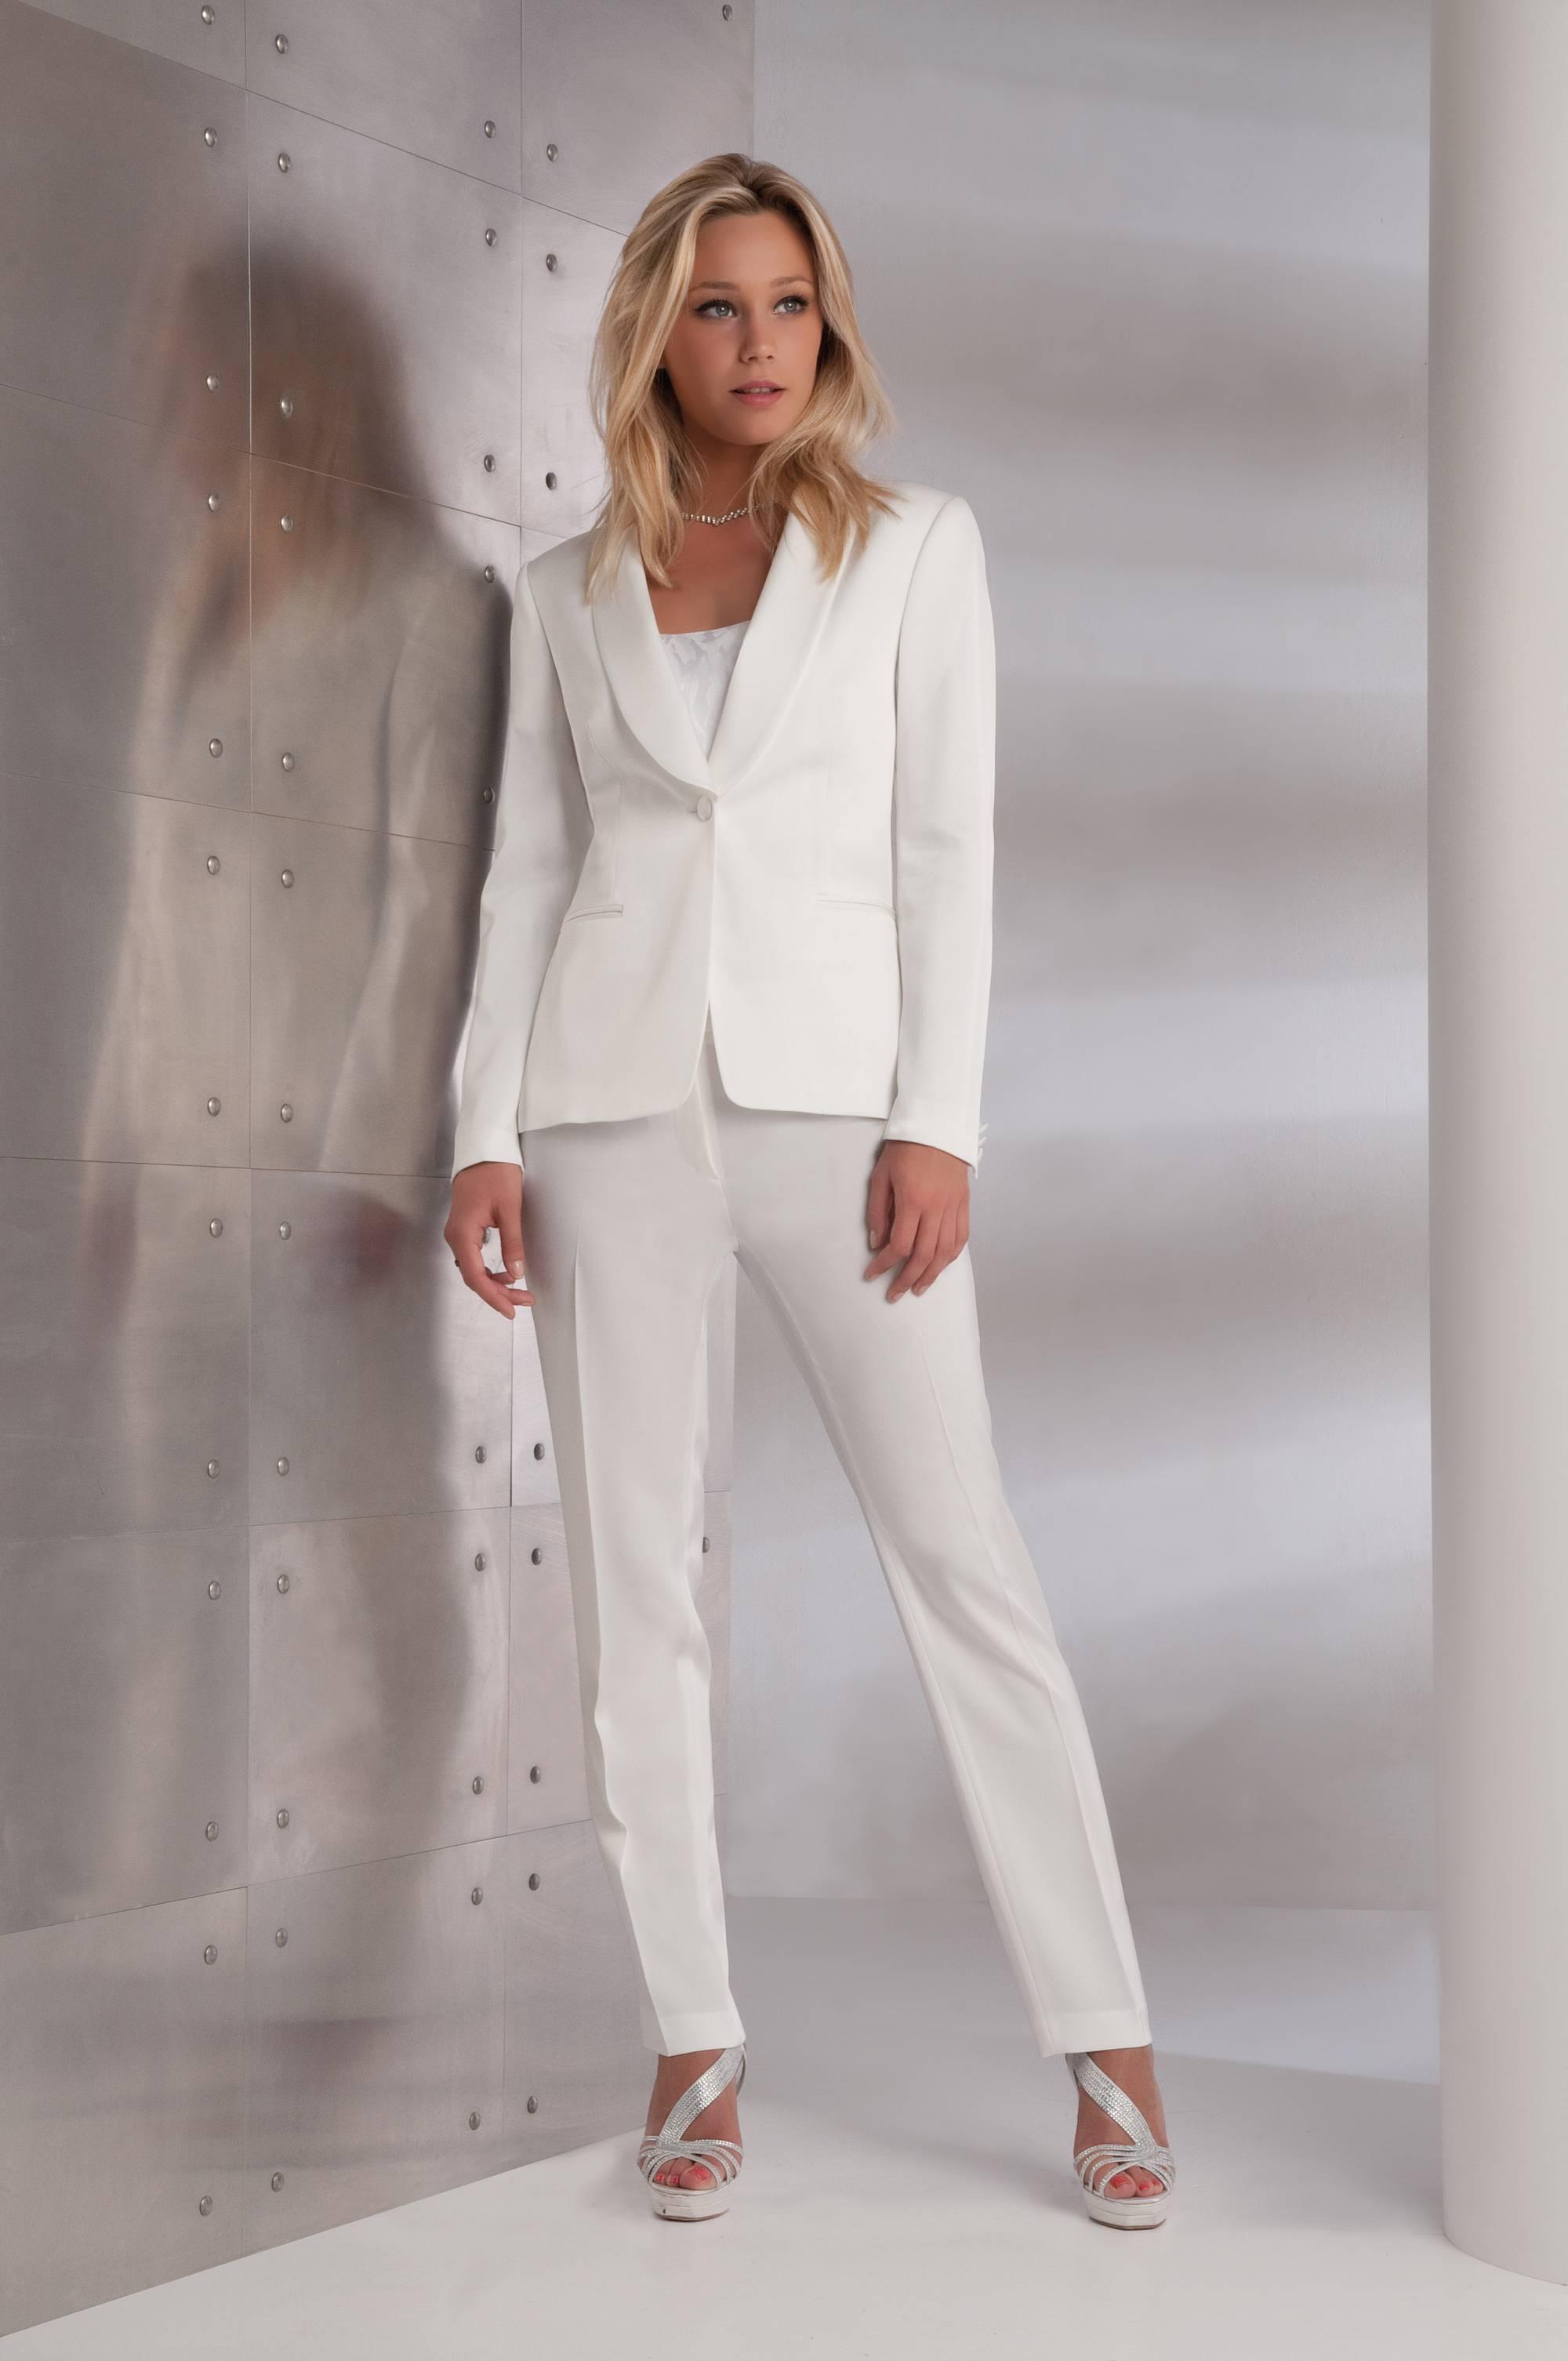 Ceremonie Veste Femme Blanche Vetement Fitness Et Mode 5qqEr6xd